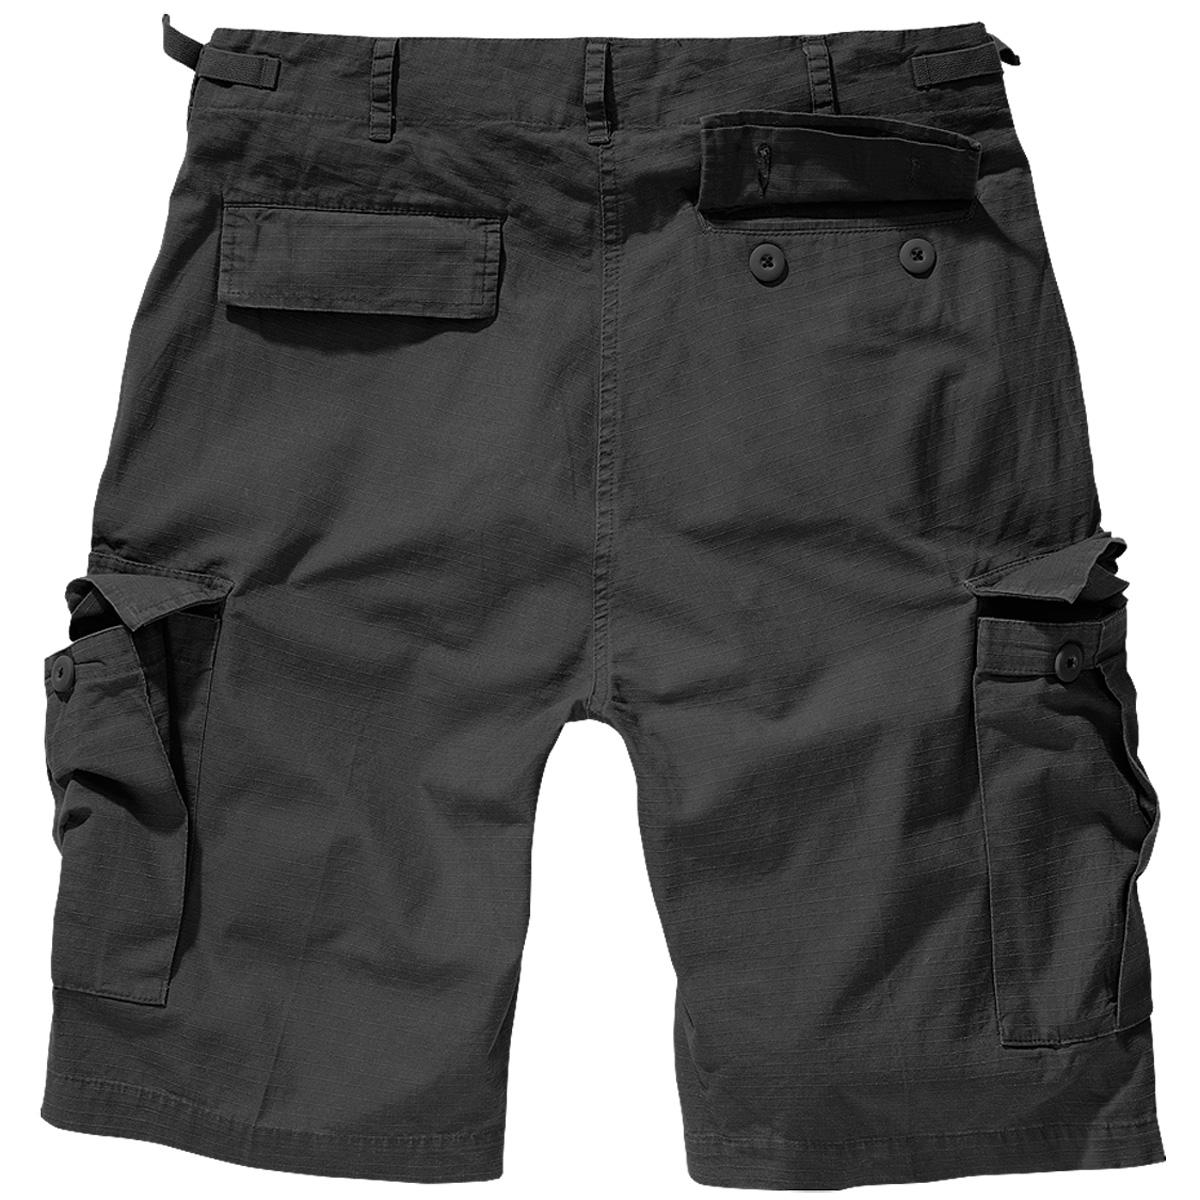 Brandit-BDU-Ripstop-Shorts-S-7XL-Army-Cargo-Bermuda-Outdoor-Short-kurze-Hose miniatura 3